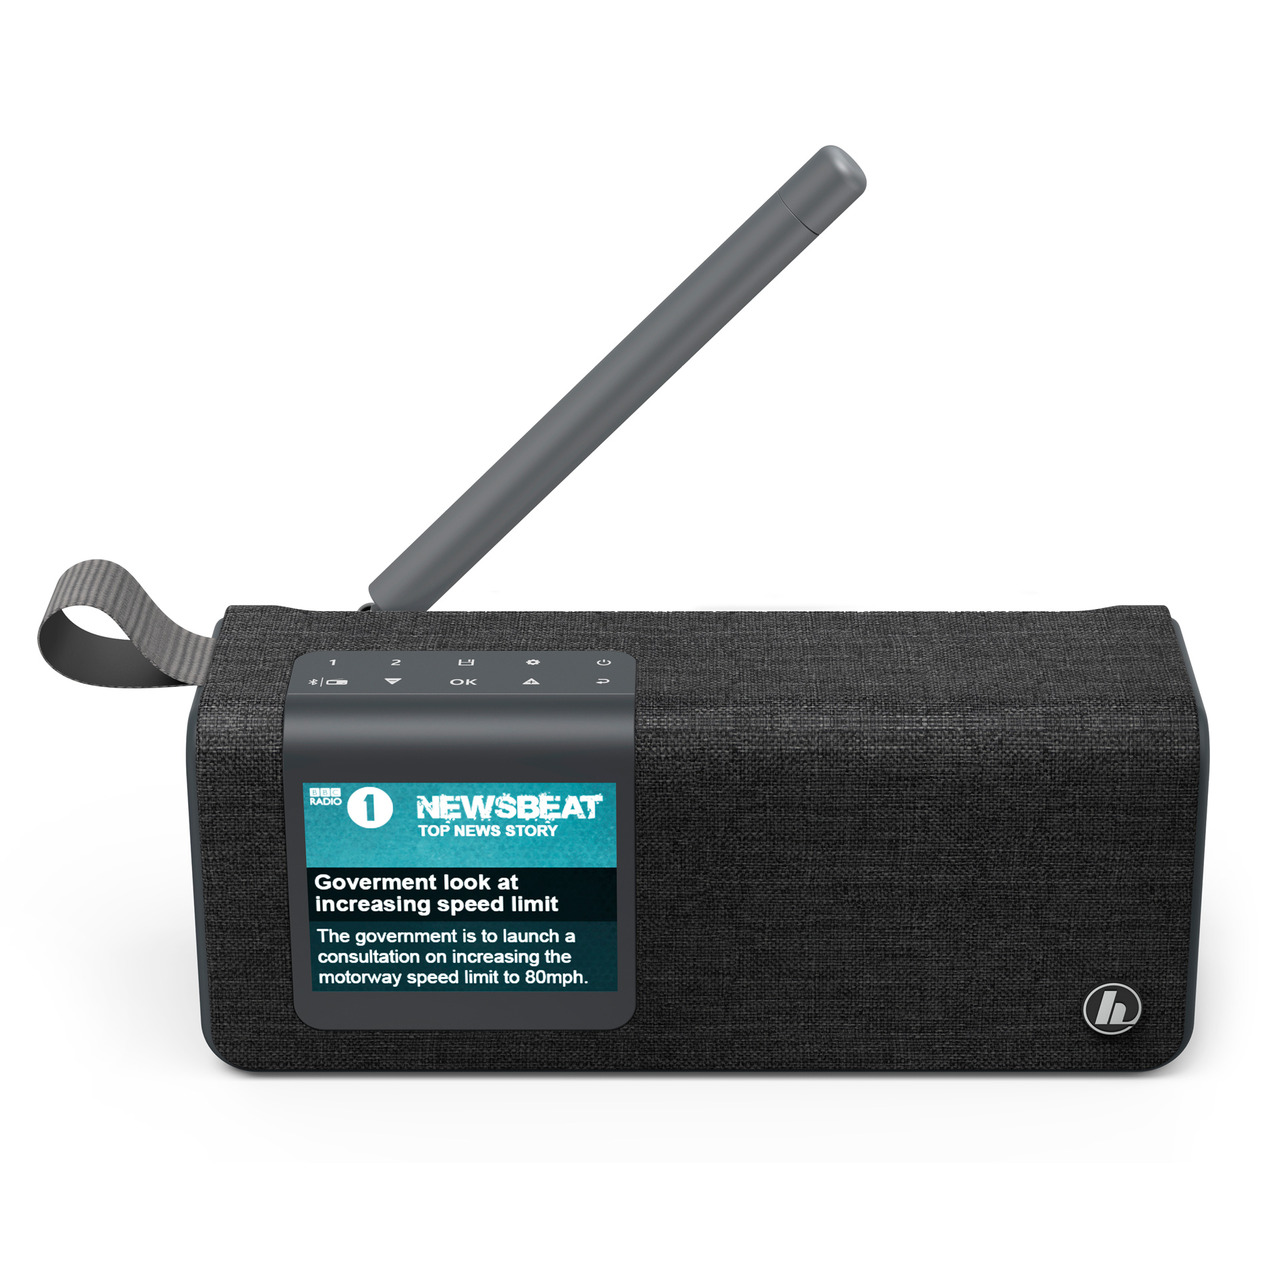 hama Portables Digitalradio DR200BT BLACK-Edition- UKW-DAB+- Akkubetrieb- Bluetooth-Lautsprecher